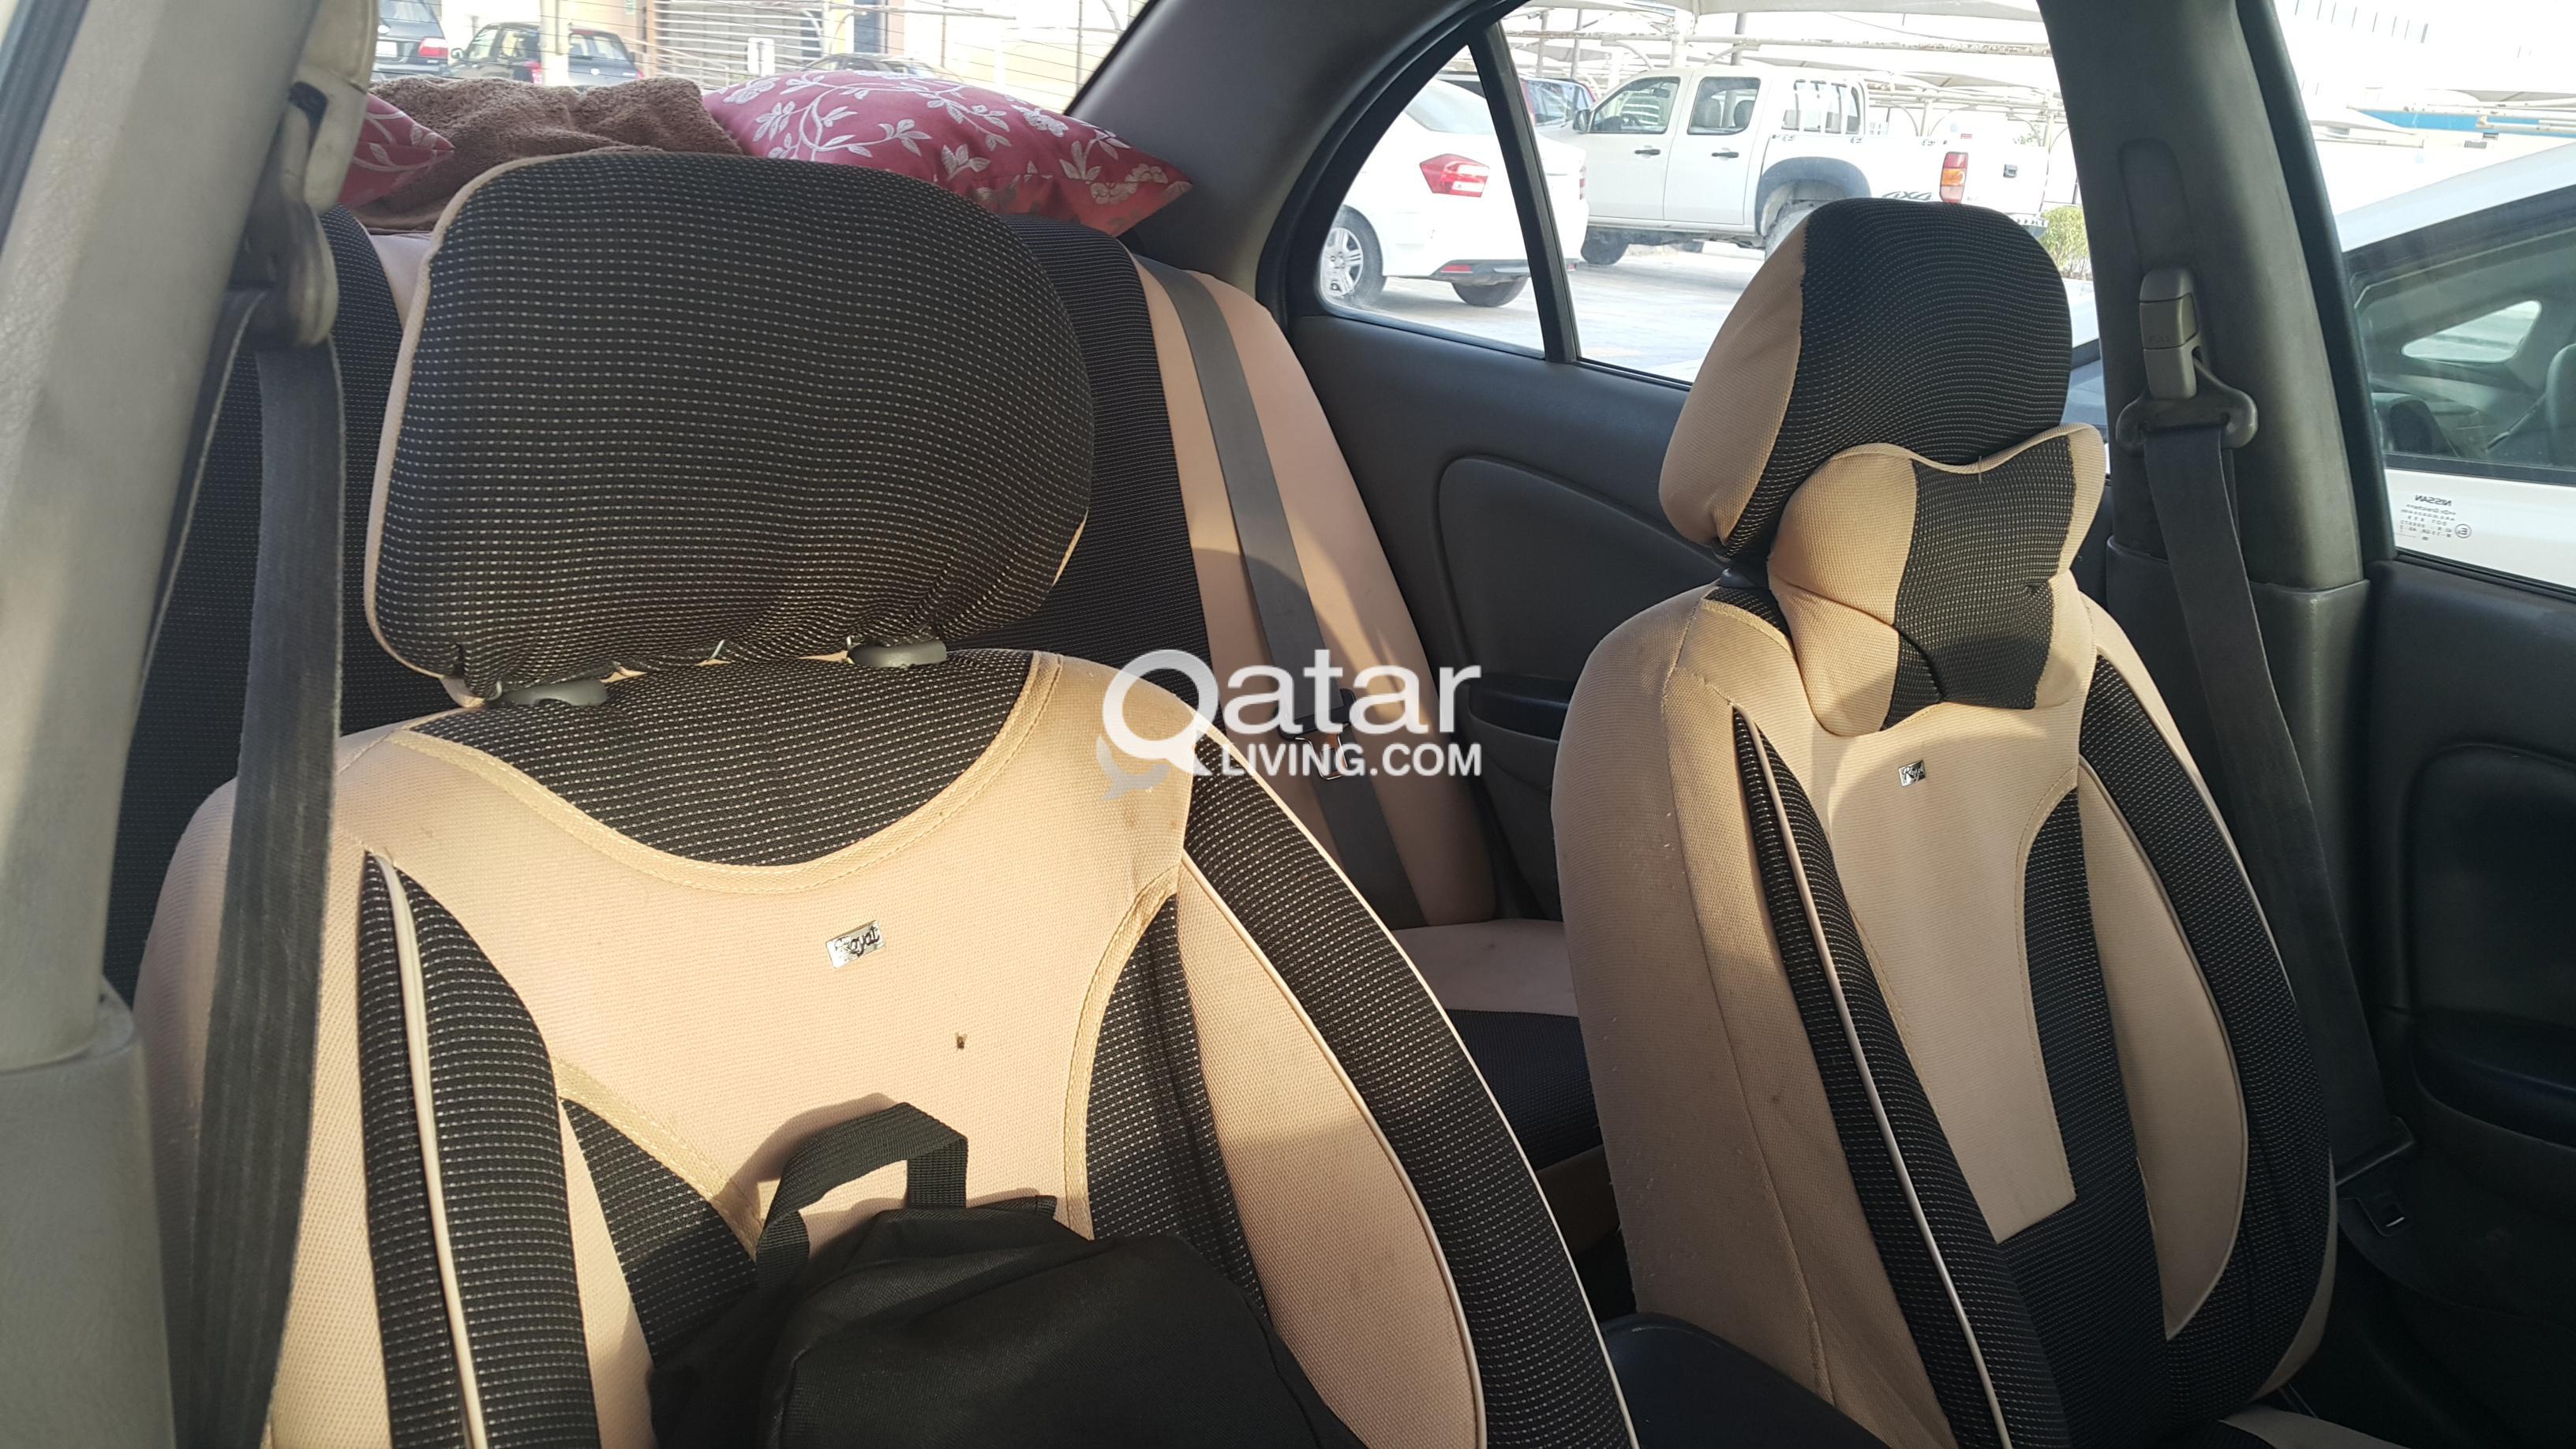 Nissan Sunny 2002 Model For Rush Sale Qatar Living